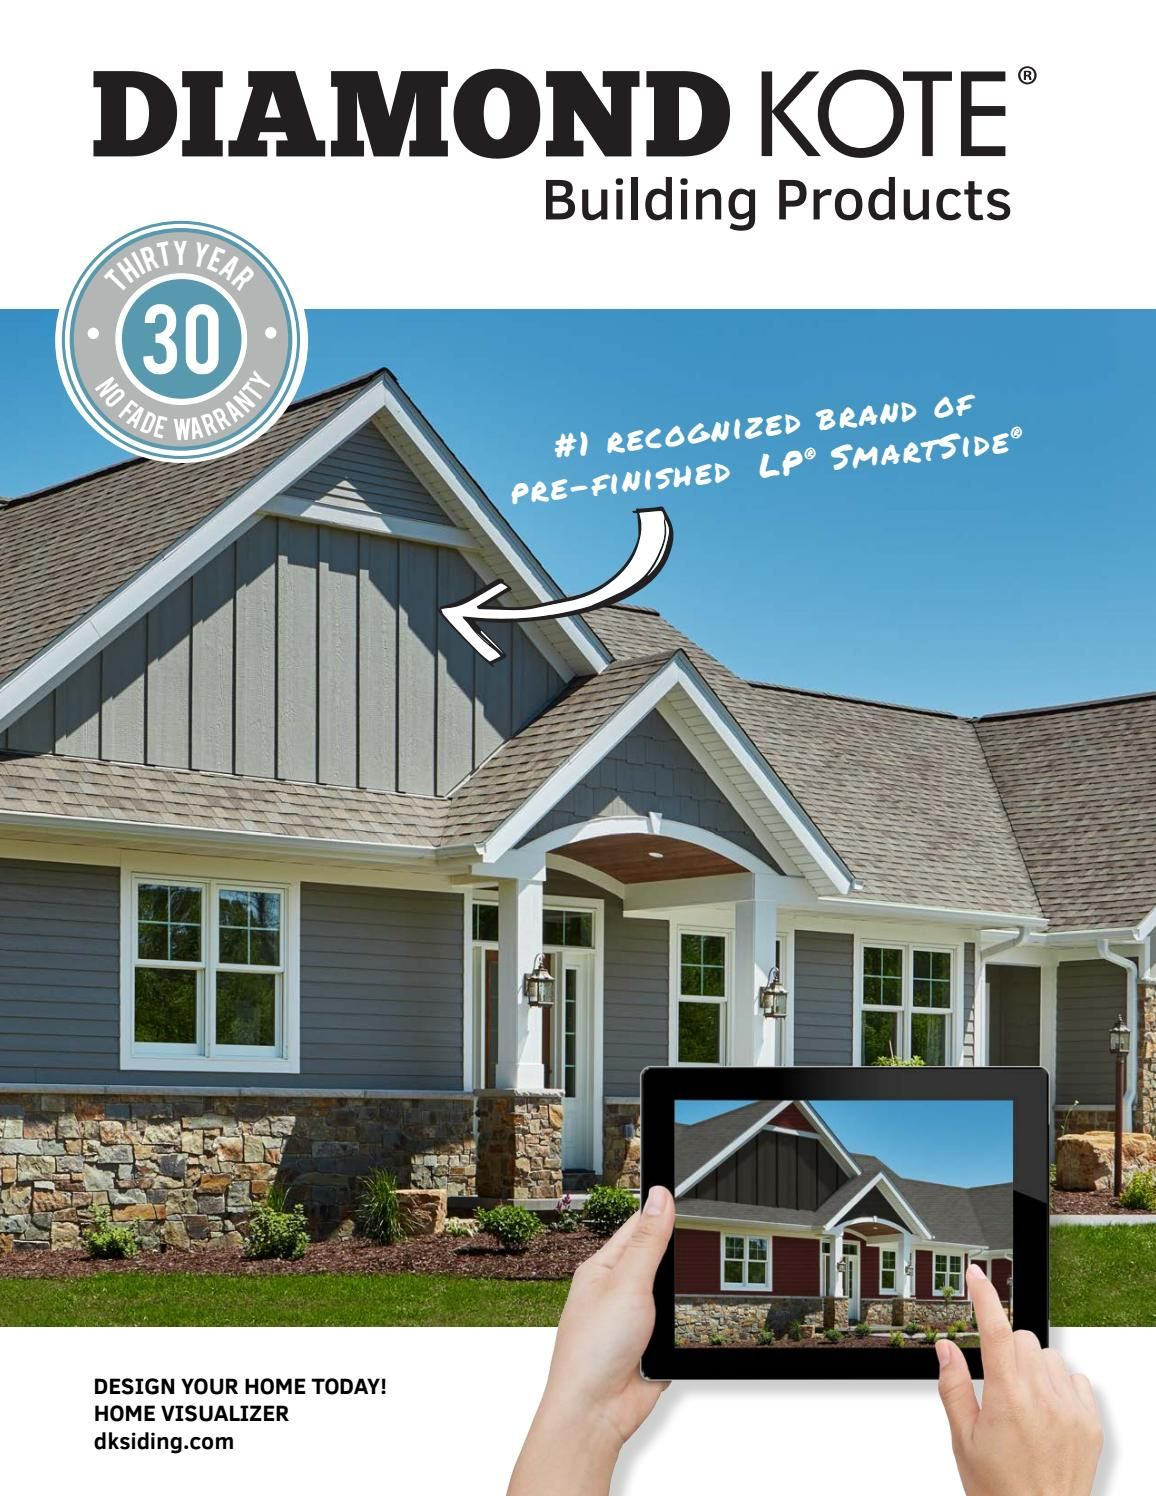 Diamond Kote Consumer Catalog 2019 Lp Smart Siding Exterior Siding Lake Houses Exterior